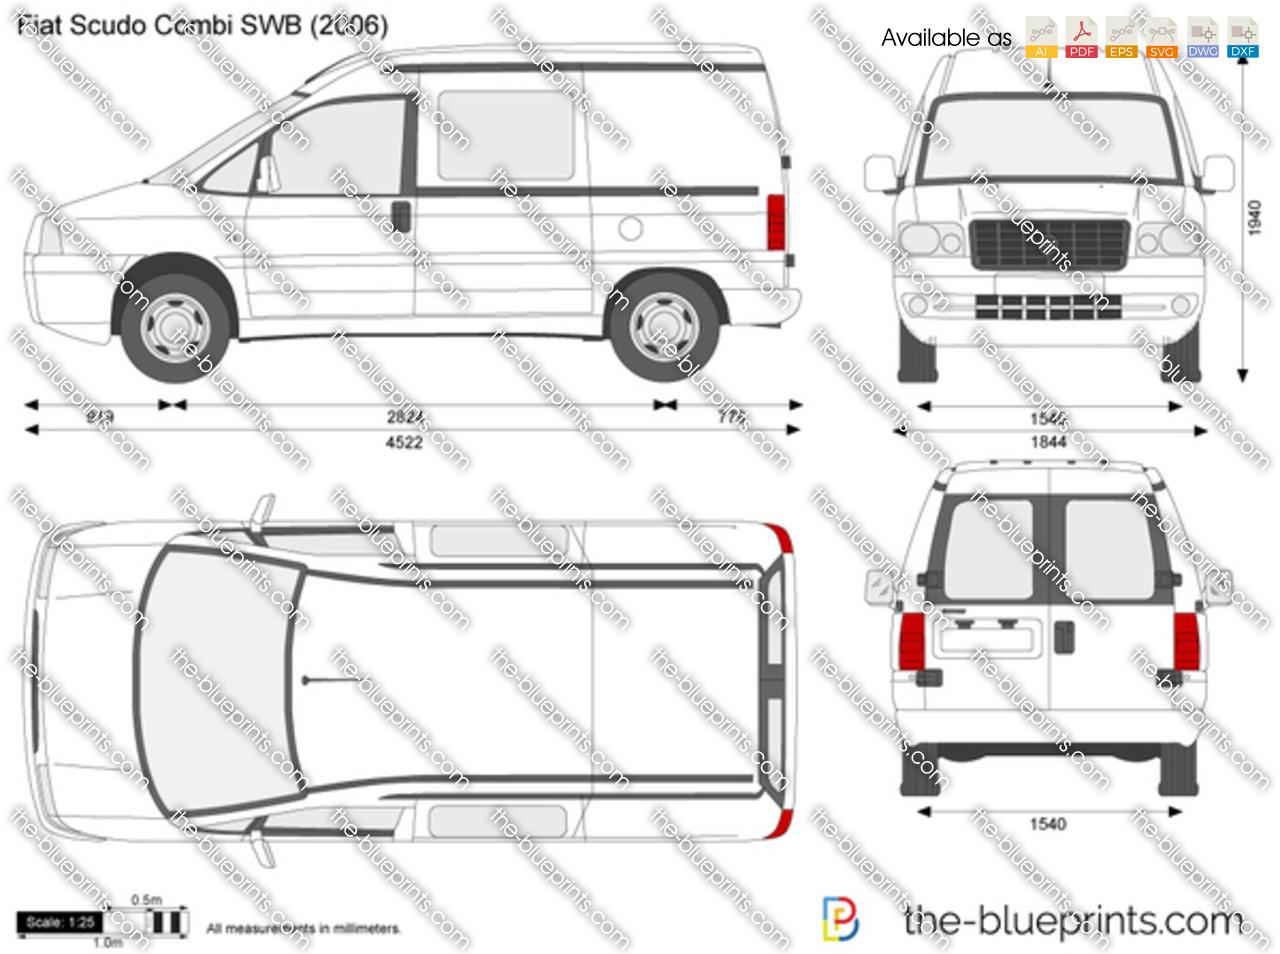 Fiat Scudo Combi SWB vector drawing